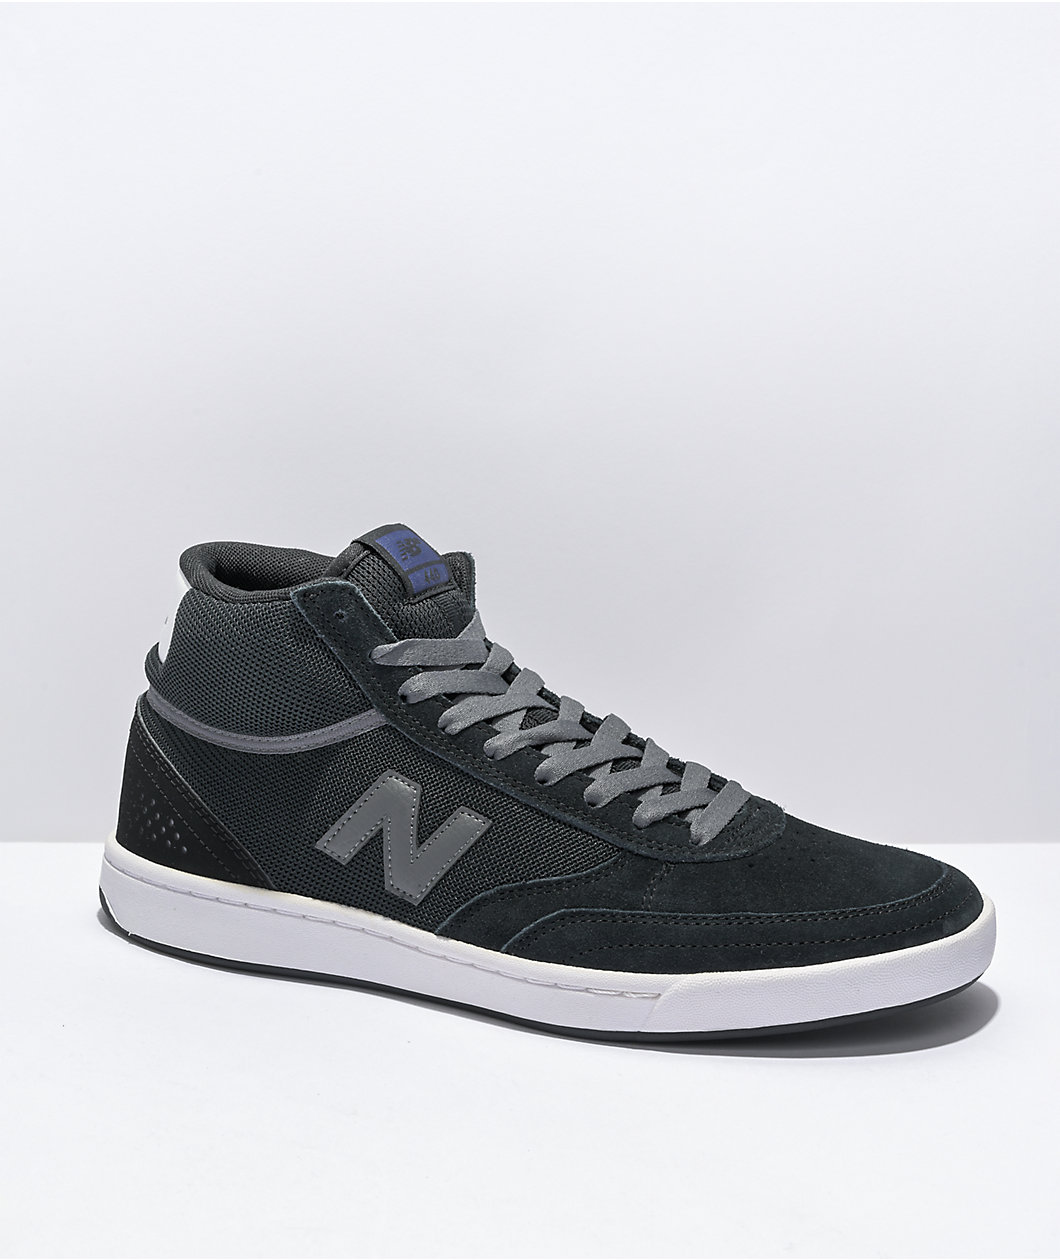 New Balance Numeric 440 High Top Black & Grey Skate Shoes